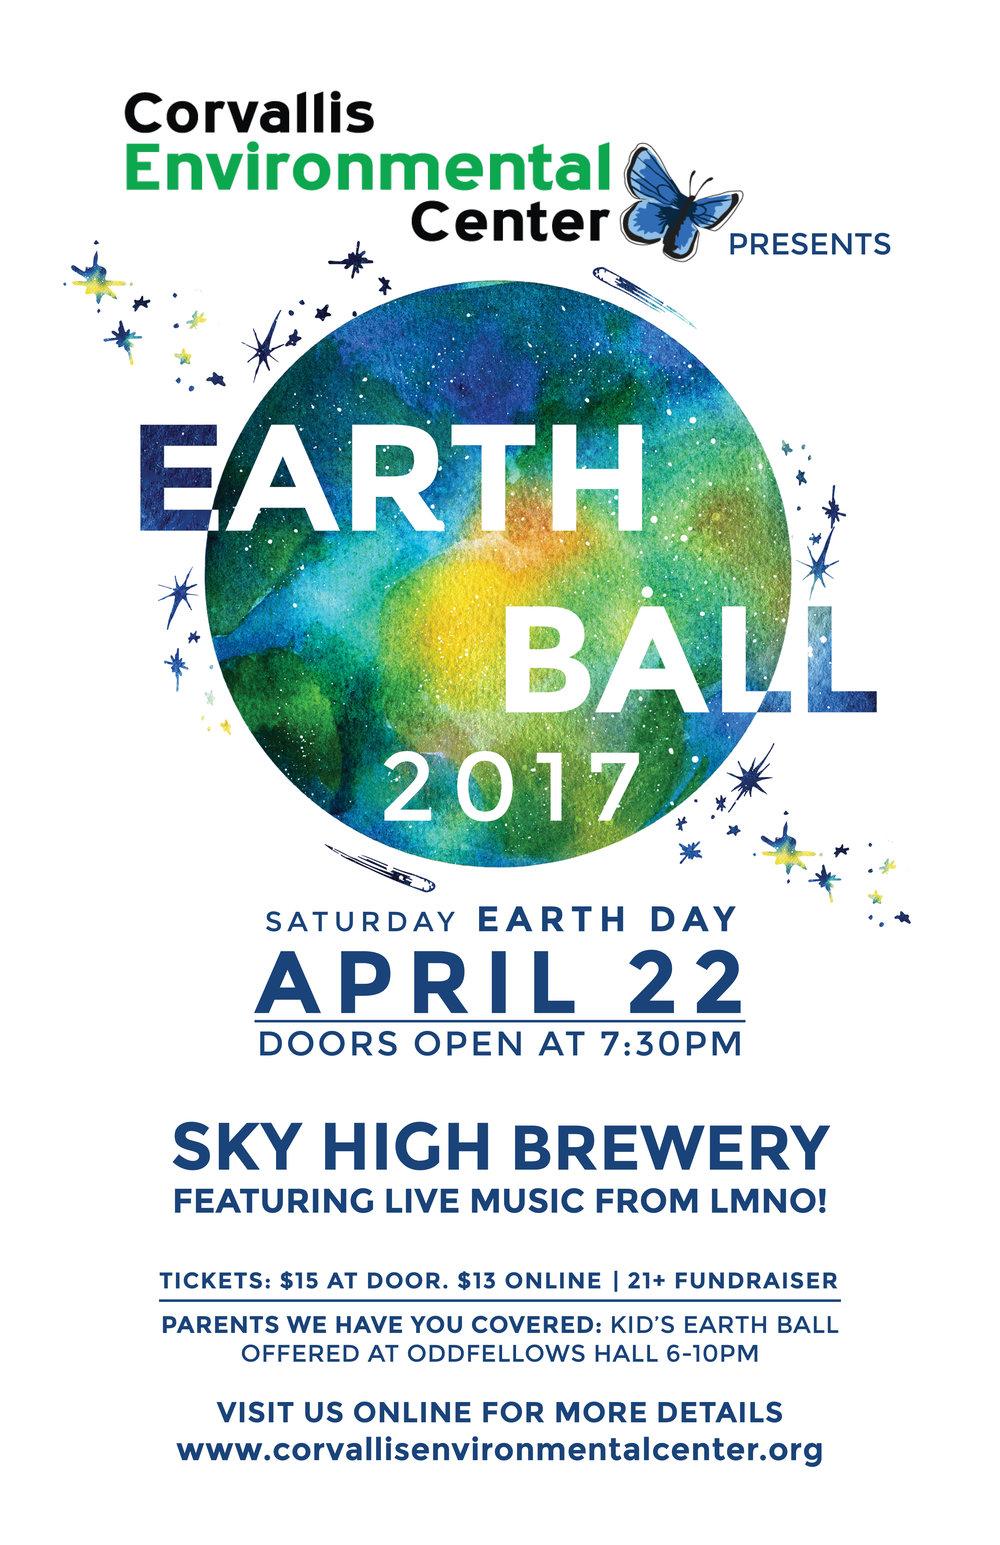 EarthBall2017_11x17_sample.jpg